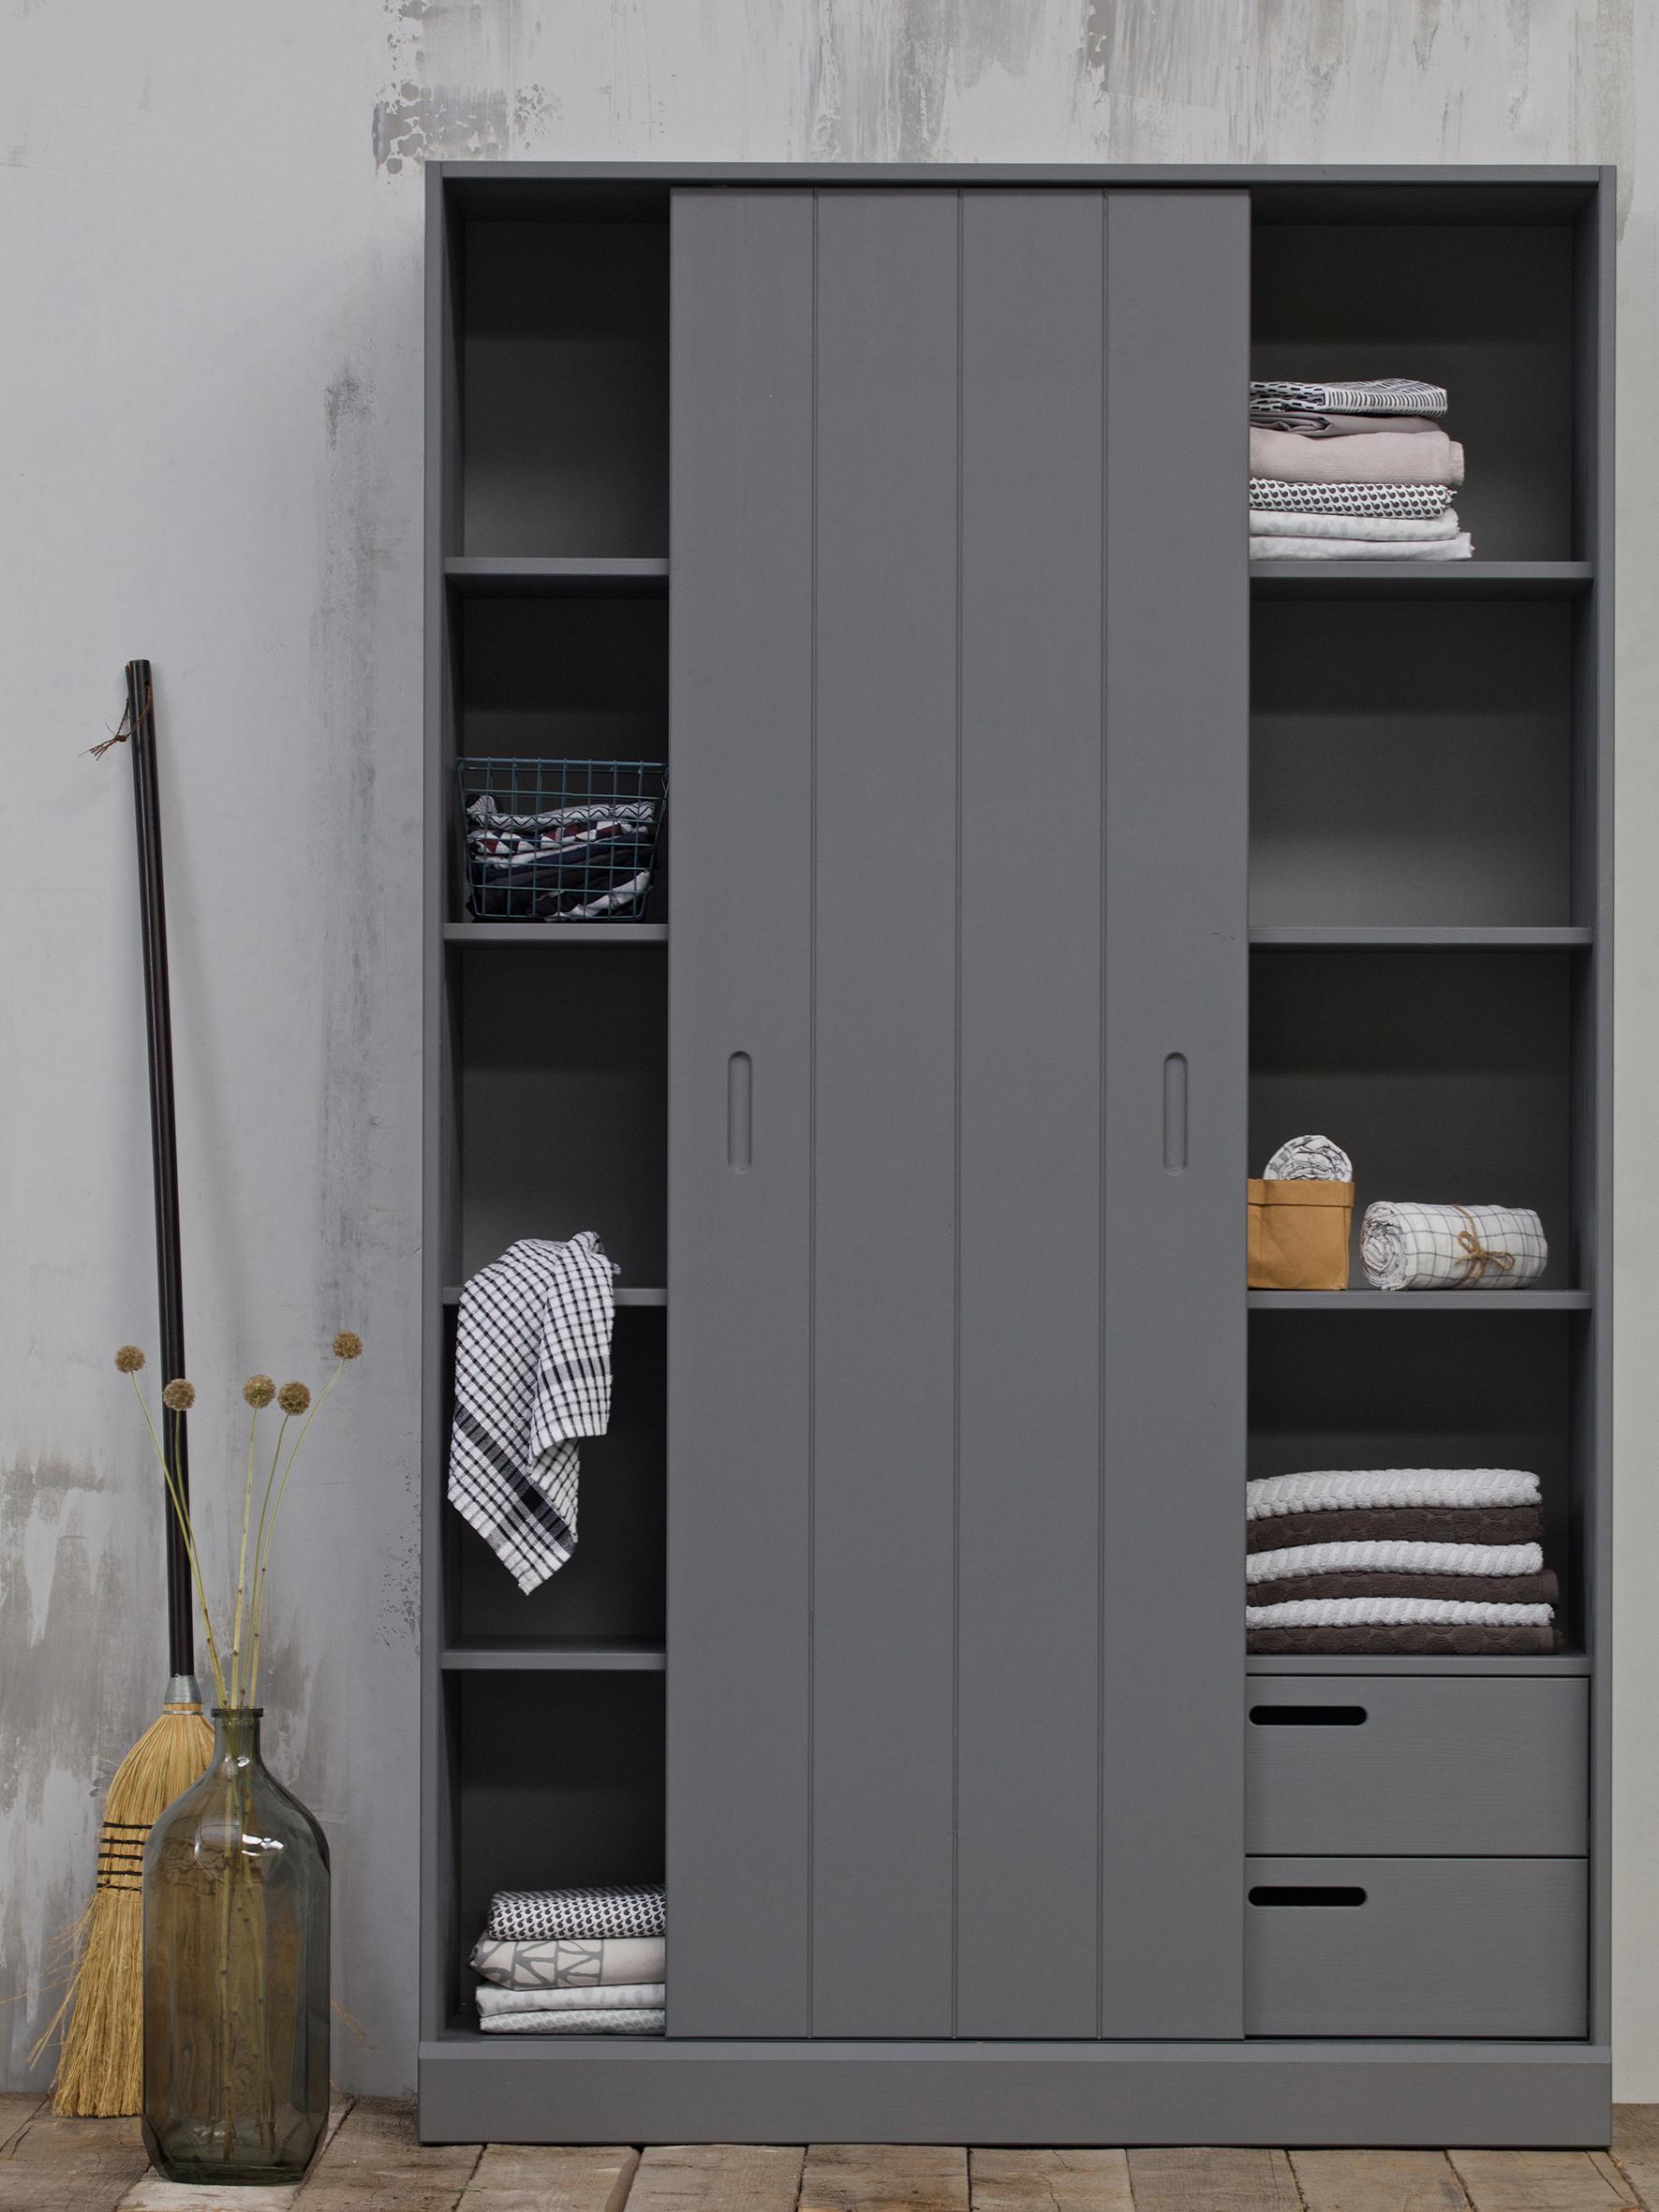 Schrank Move mit Schiebetür, Kiefernholz, lackiert, Grau, 120 x 200 cm